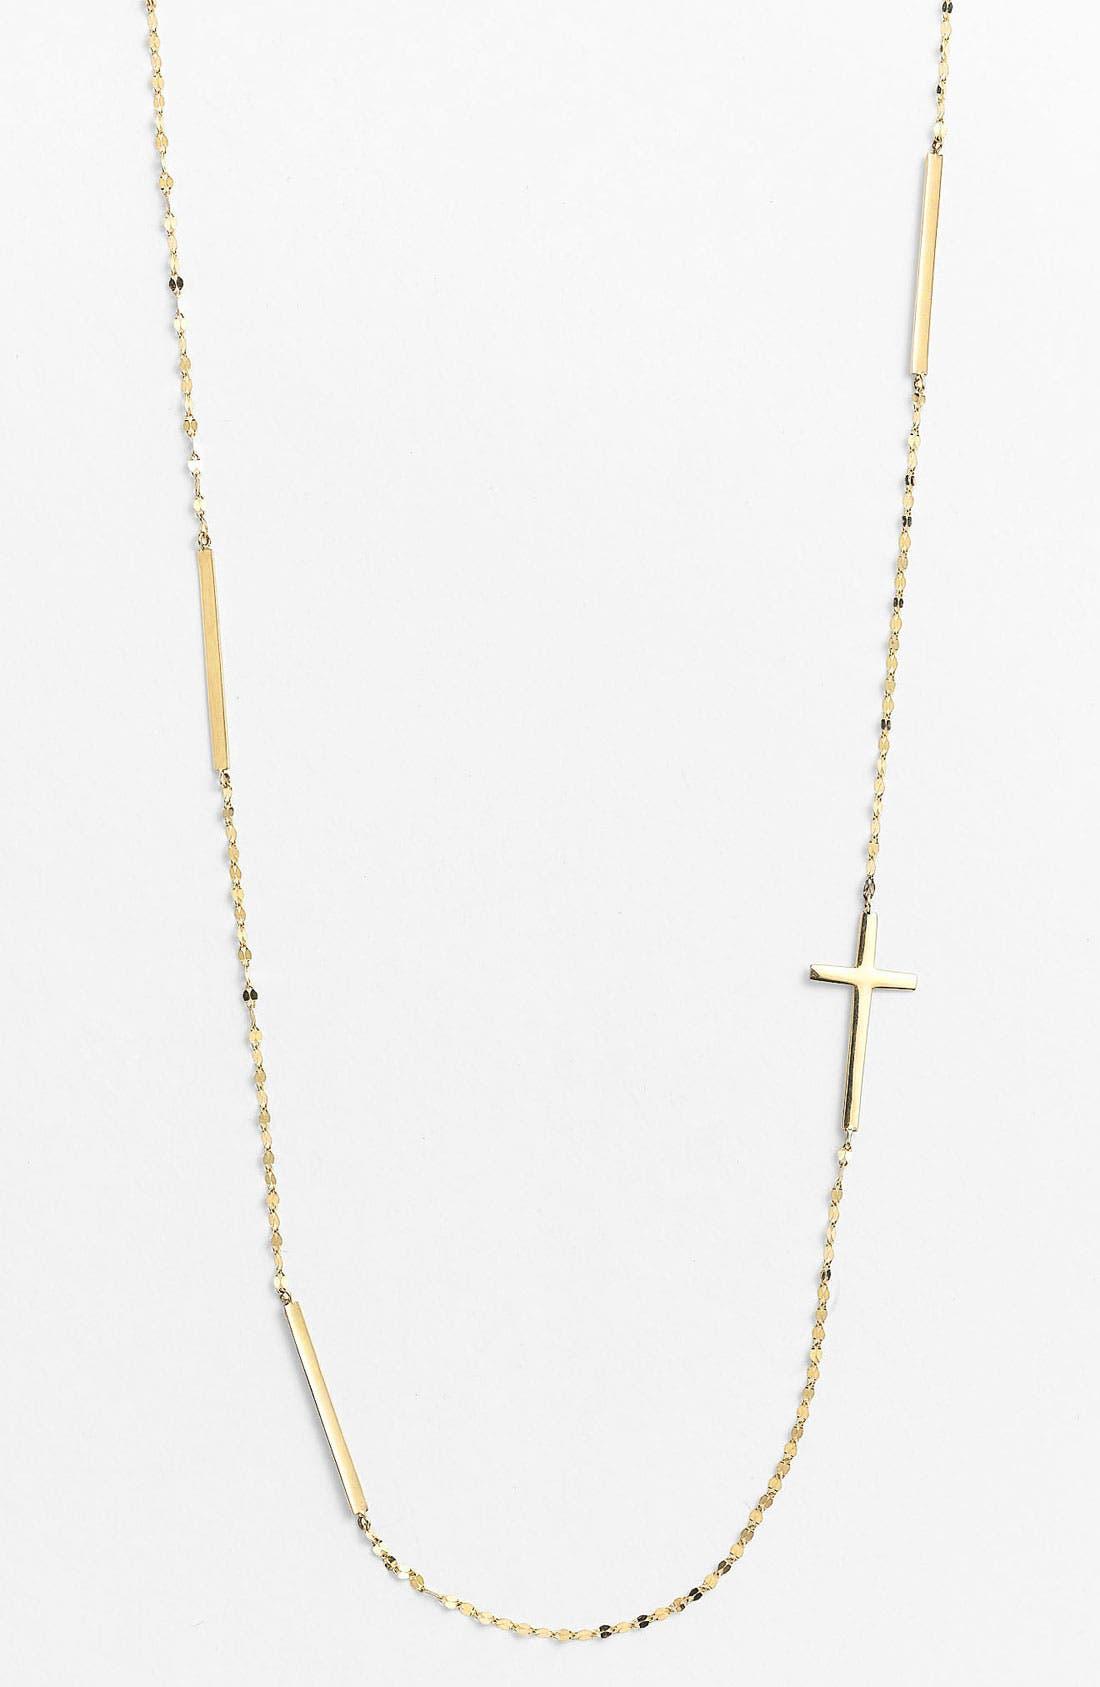 Main Image - Lana Jewelry Bar & Cross Station Necklace